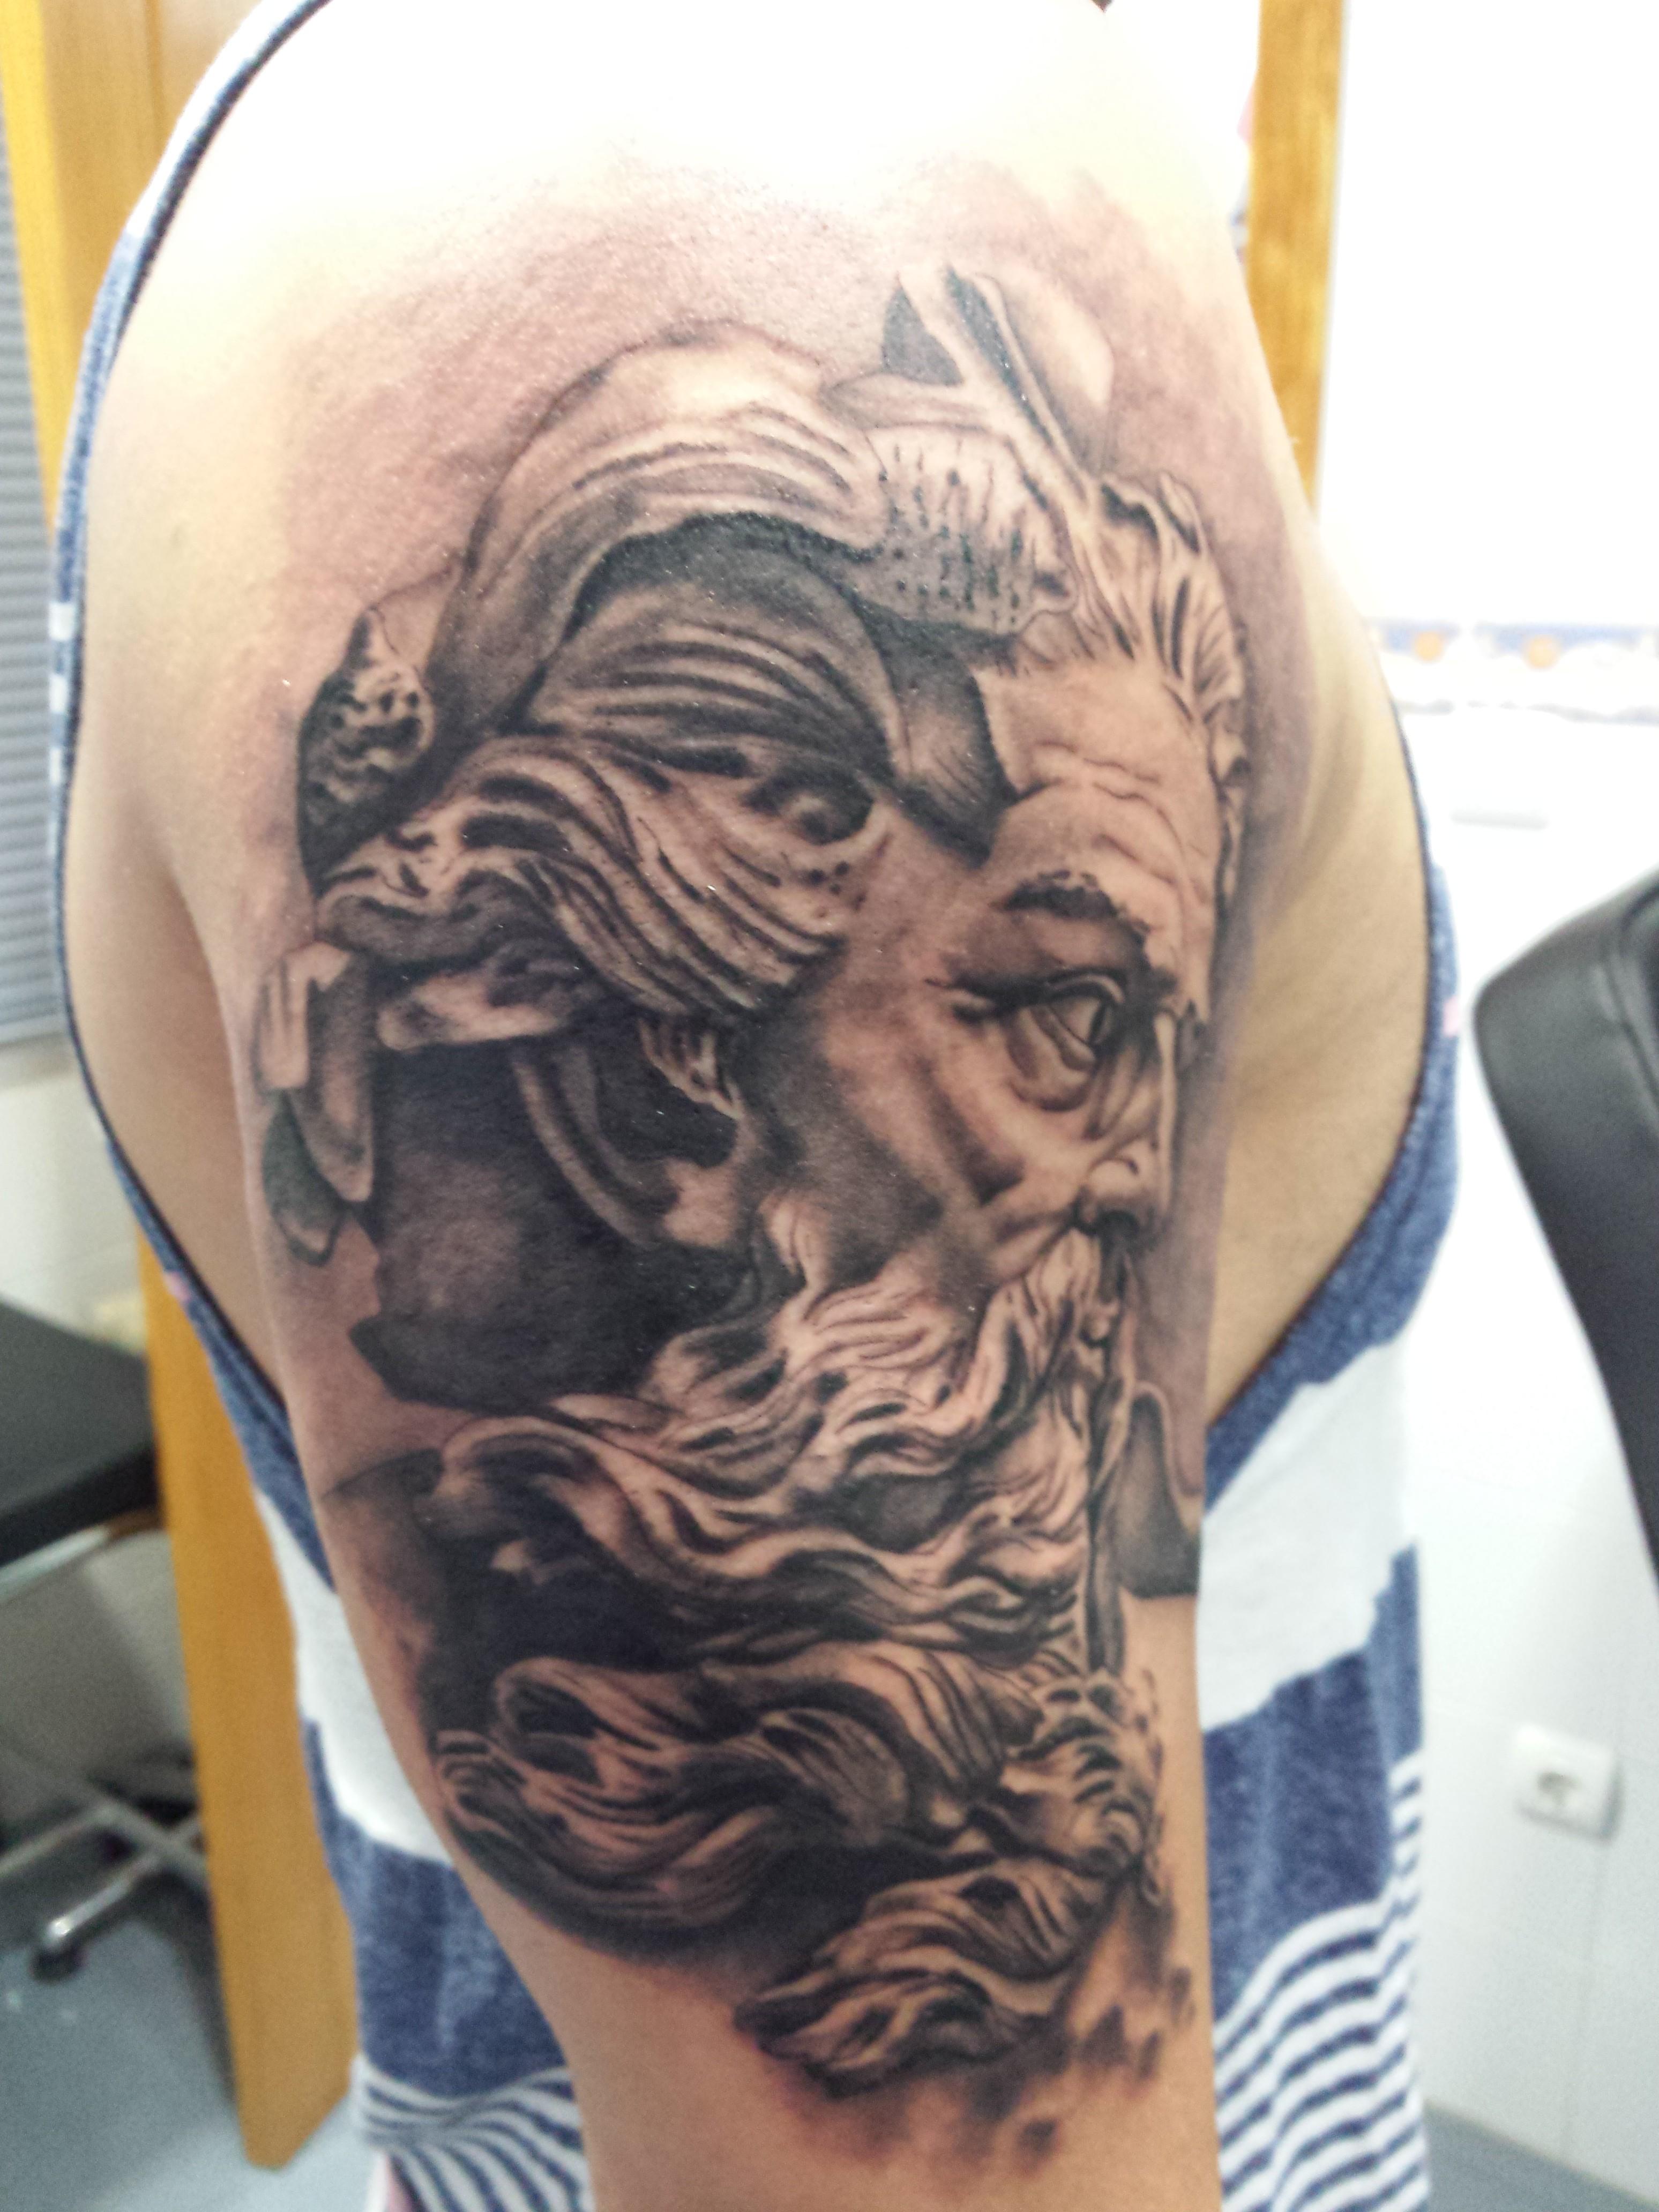 tatuaje neptuno-poseidon-tatuajes L'Eliana-jorge garcía